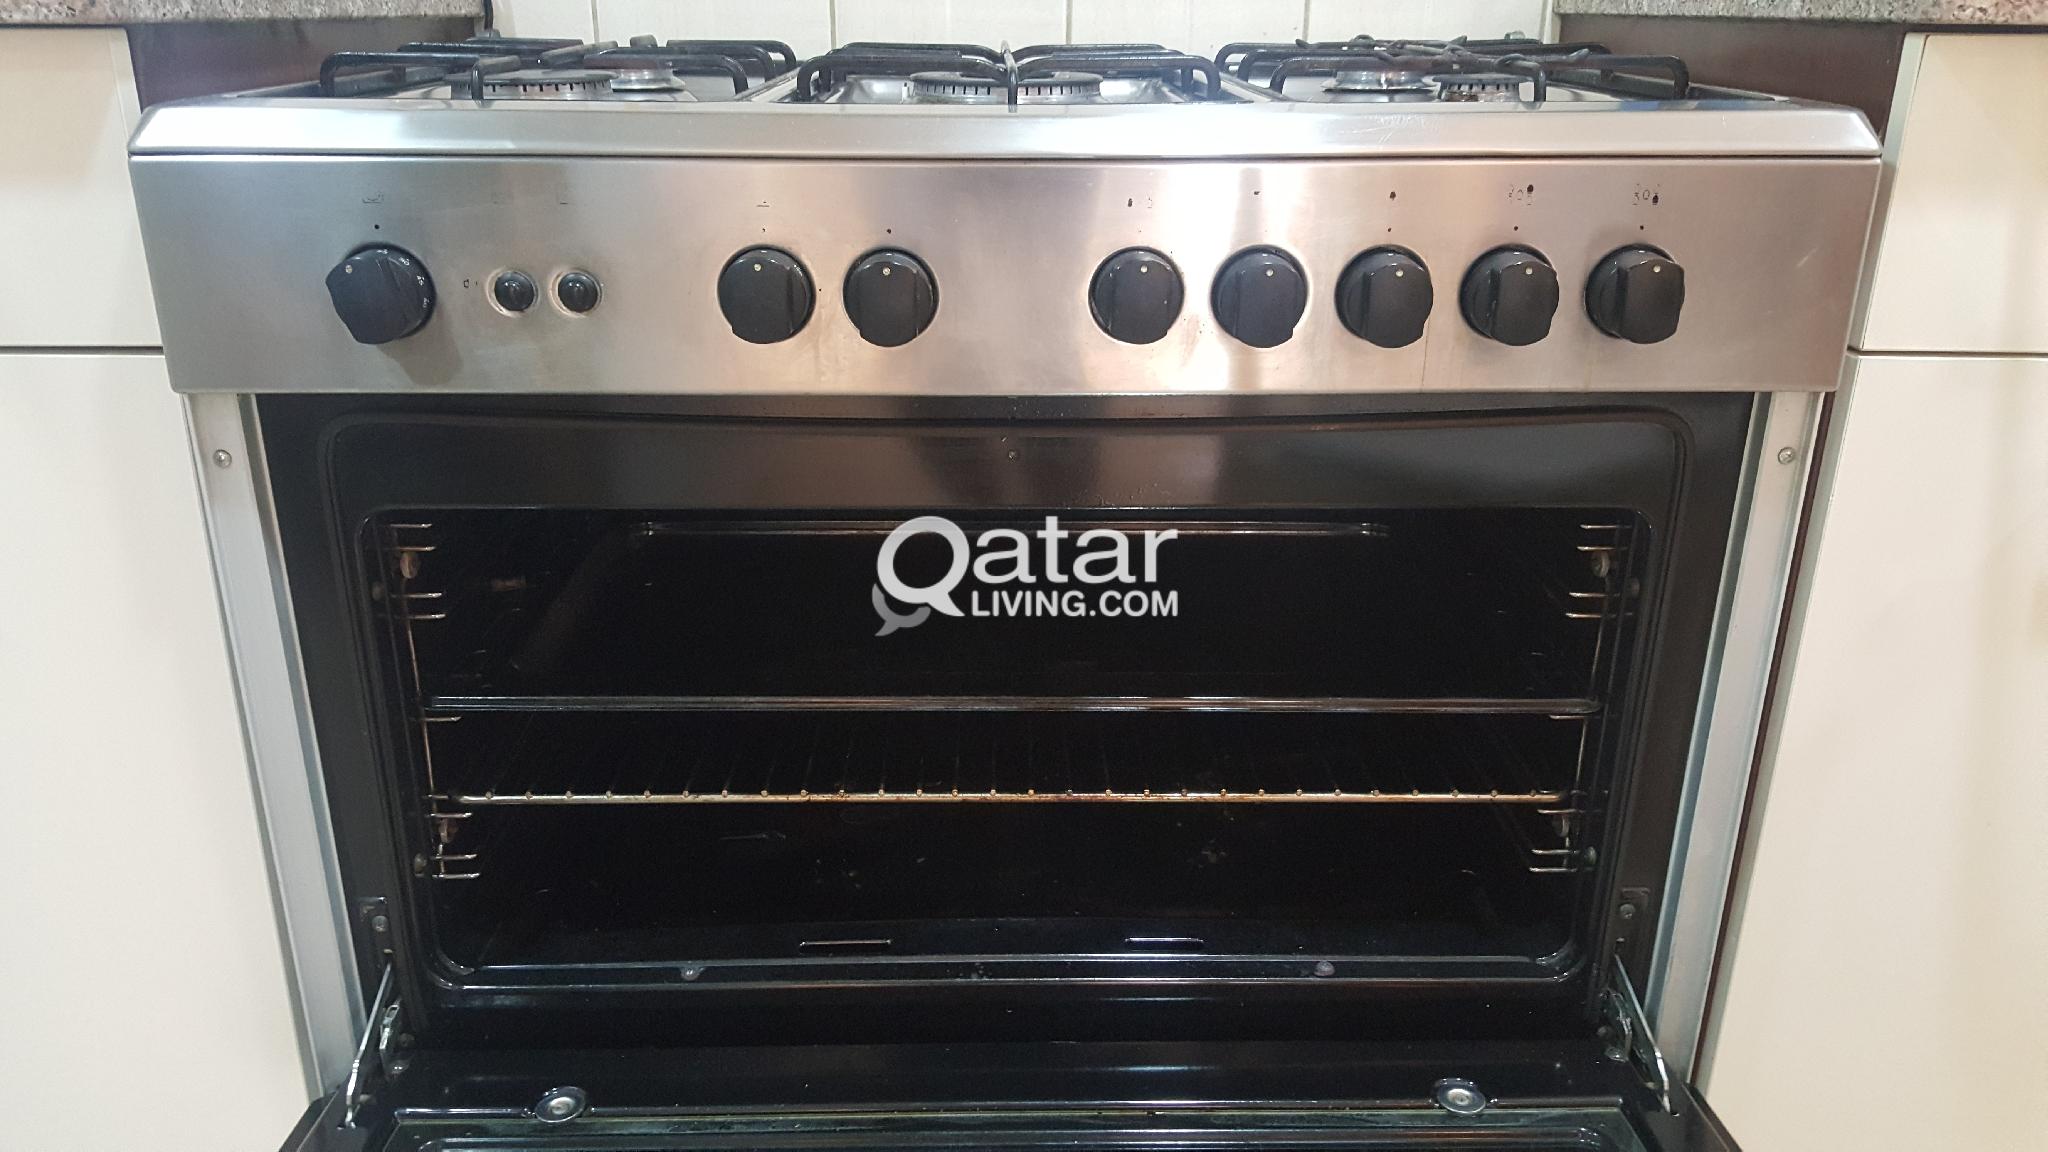 Siemens Gaz & Oven QR 450